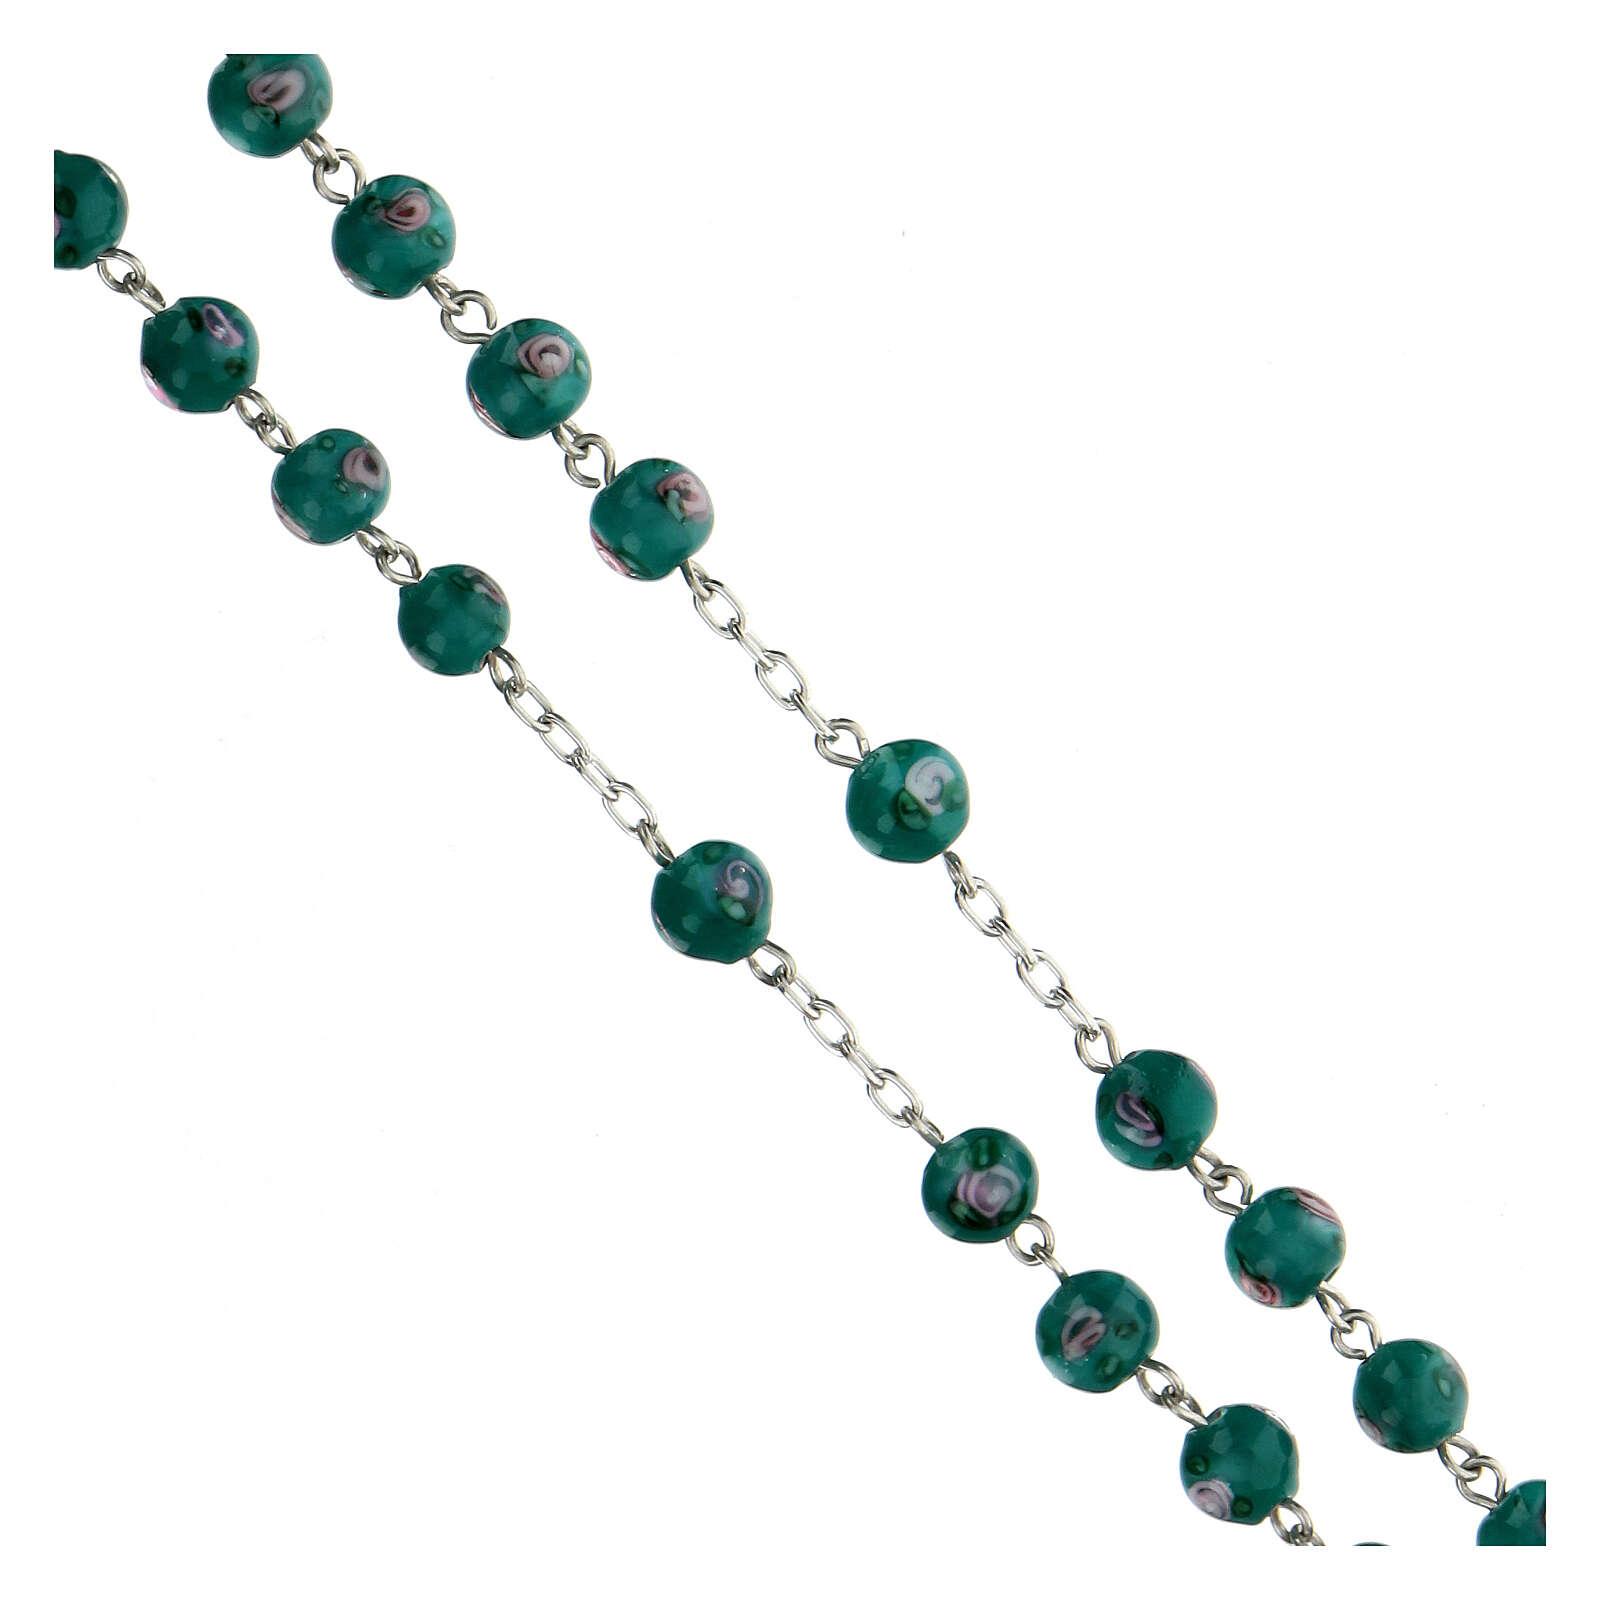 Rosario plata 925 granos perlas verde 6 mm rosas cruz perforada 4